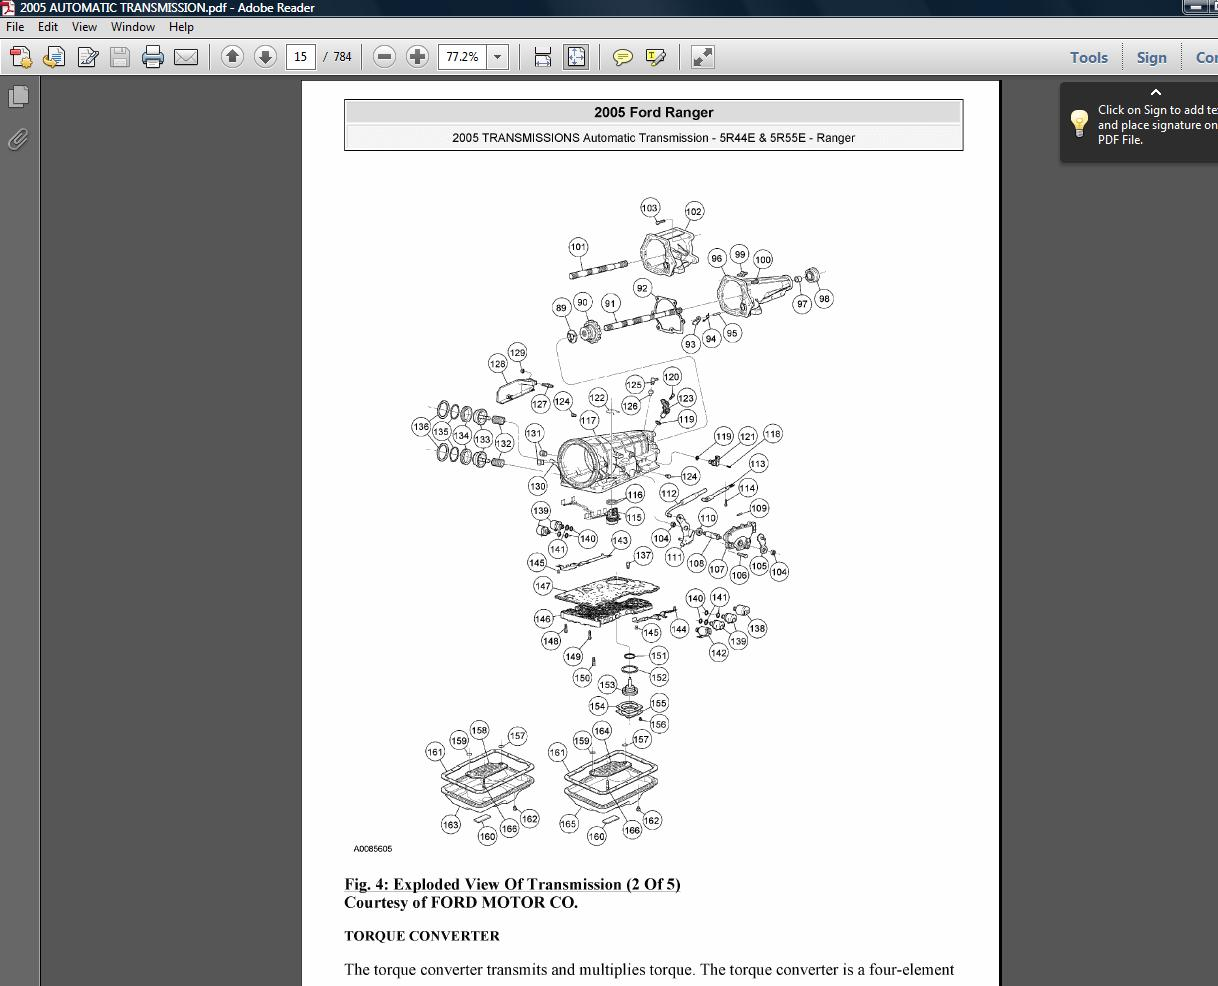 medium resolution of 2001 02 03 04 05 06 07 08 5r44e 5r55e ford ranger automatic transmission pdf manual download